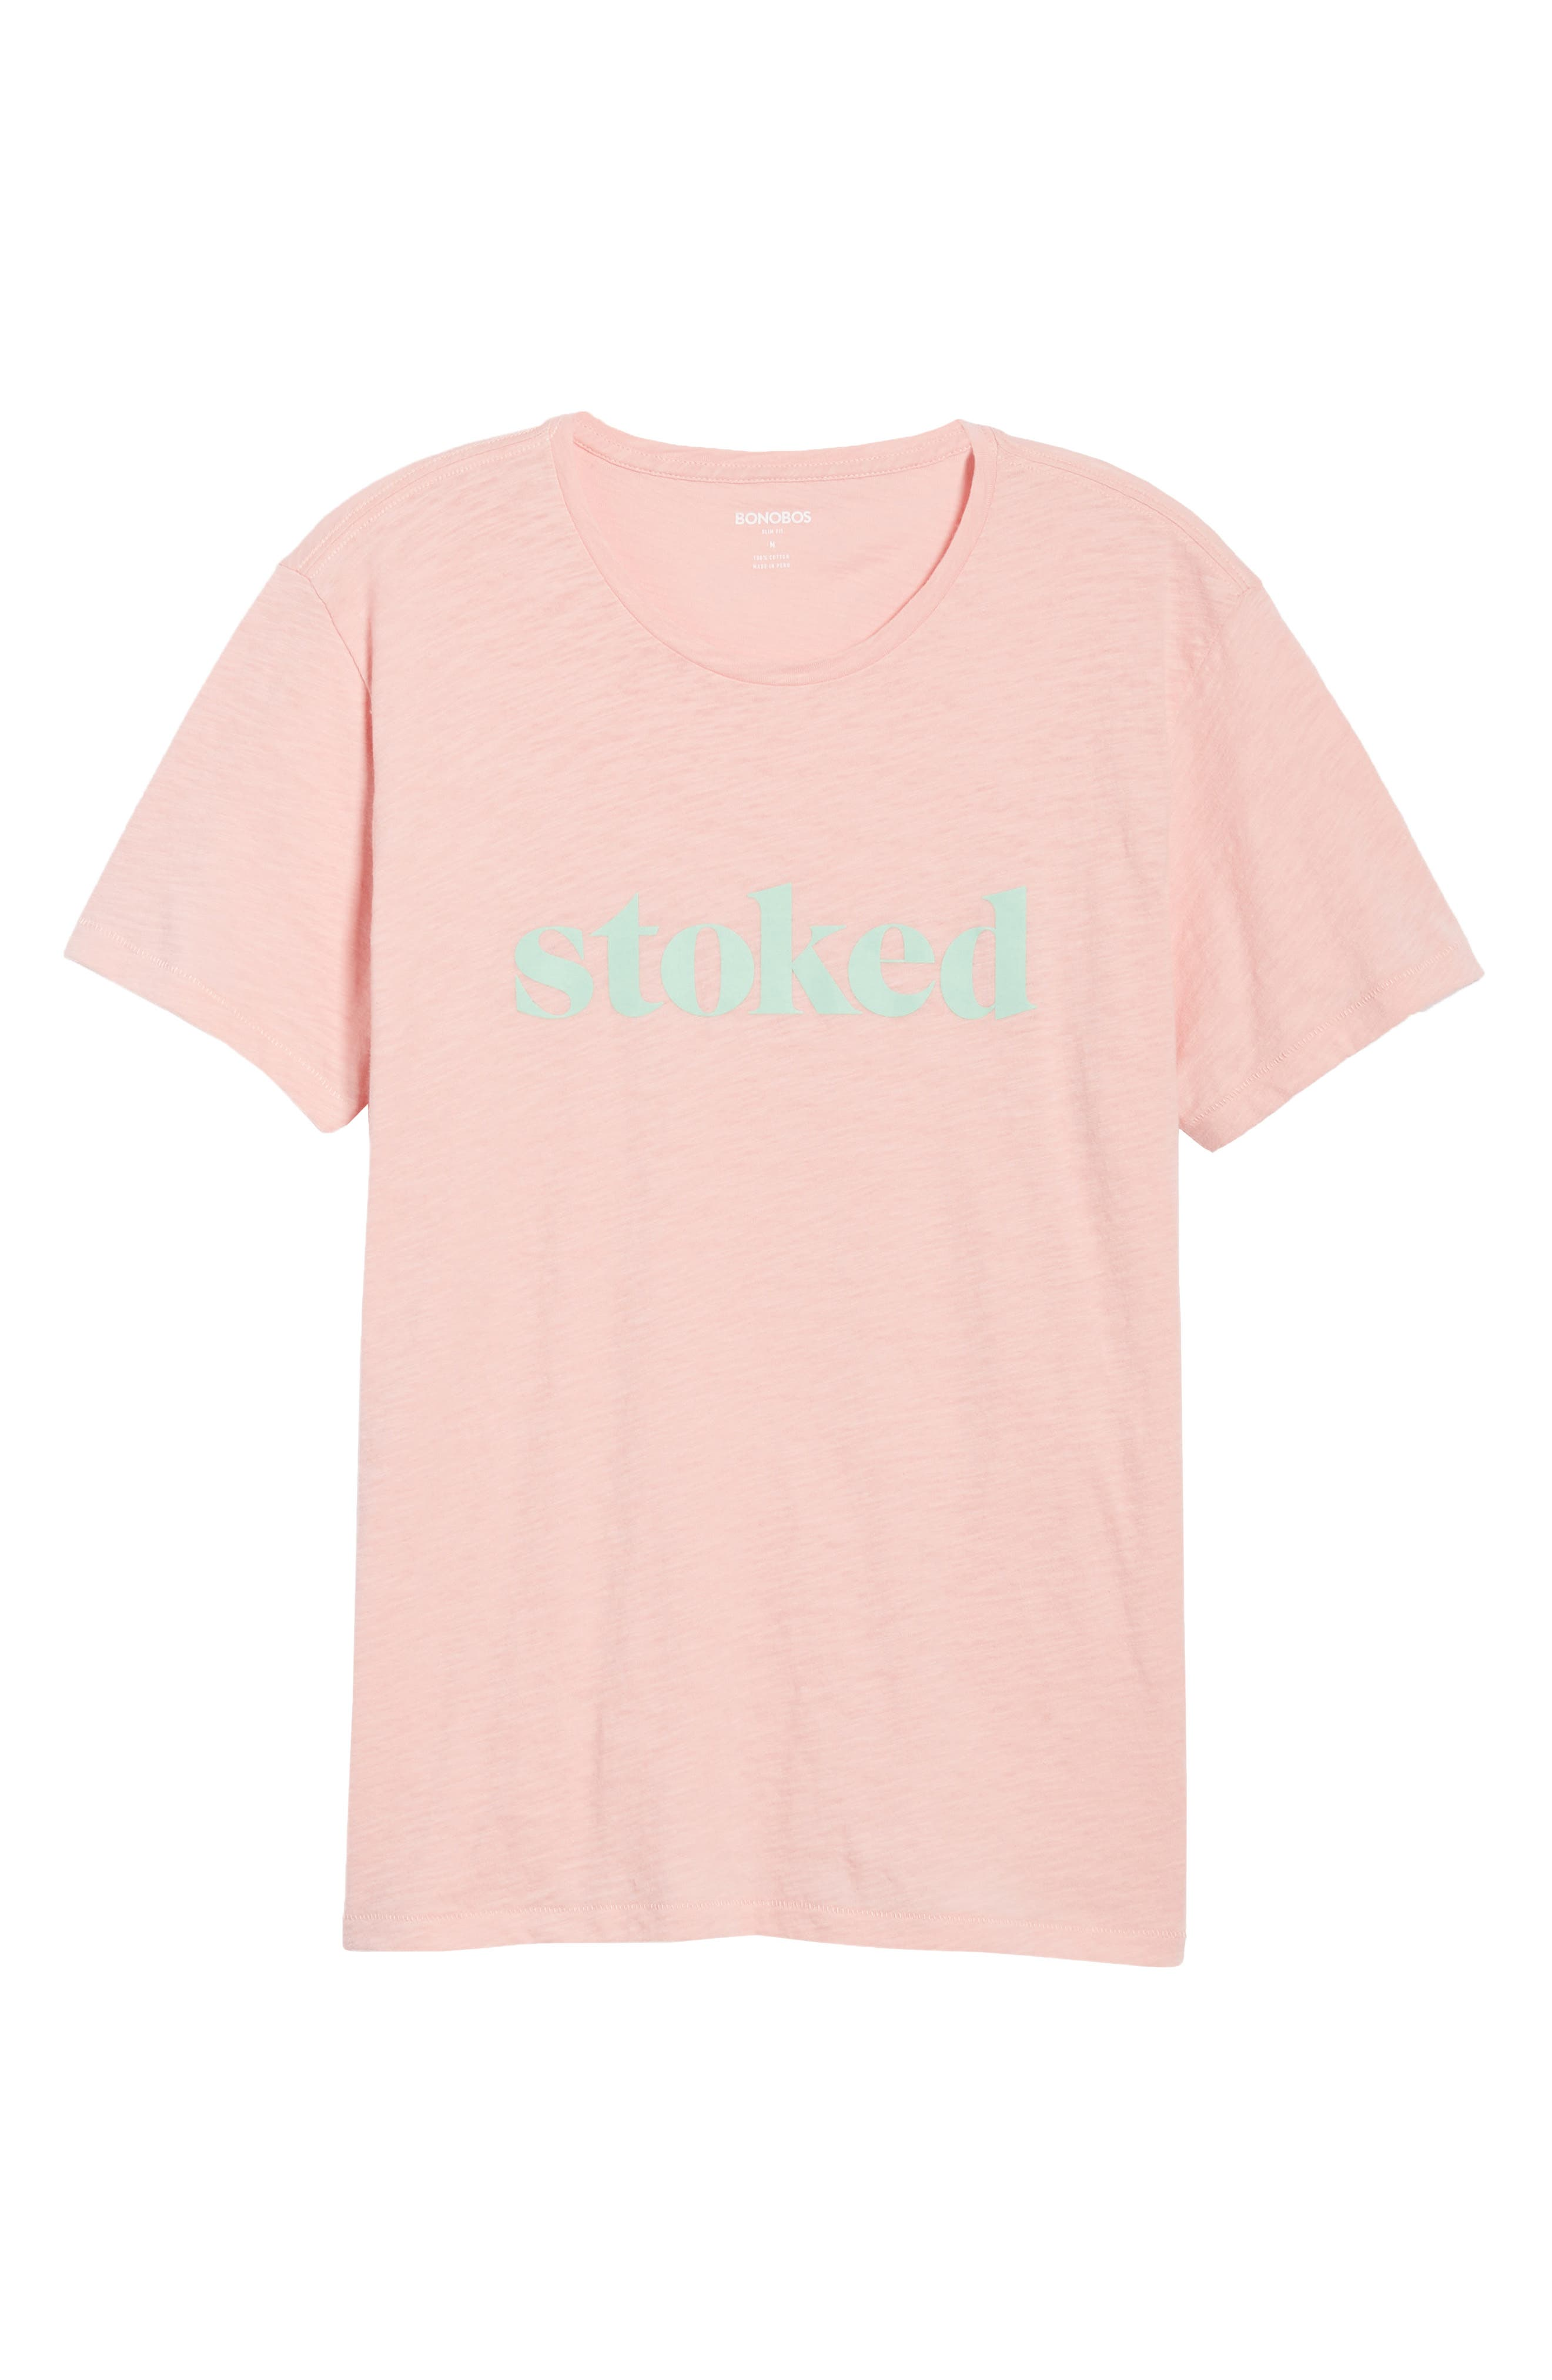 Stoked Slub T-Shirt,                             Alternate thumbnail 6, color,                             Pink Stoked